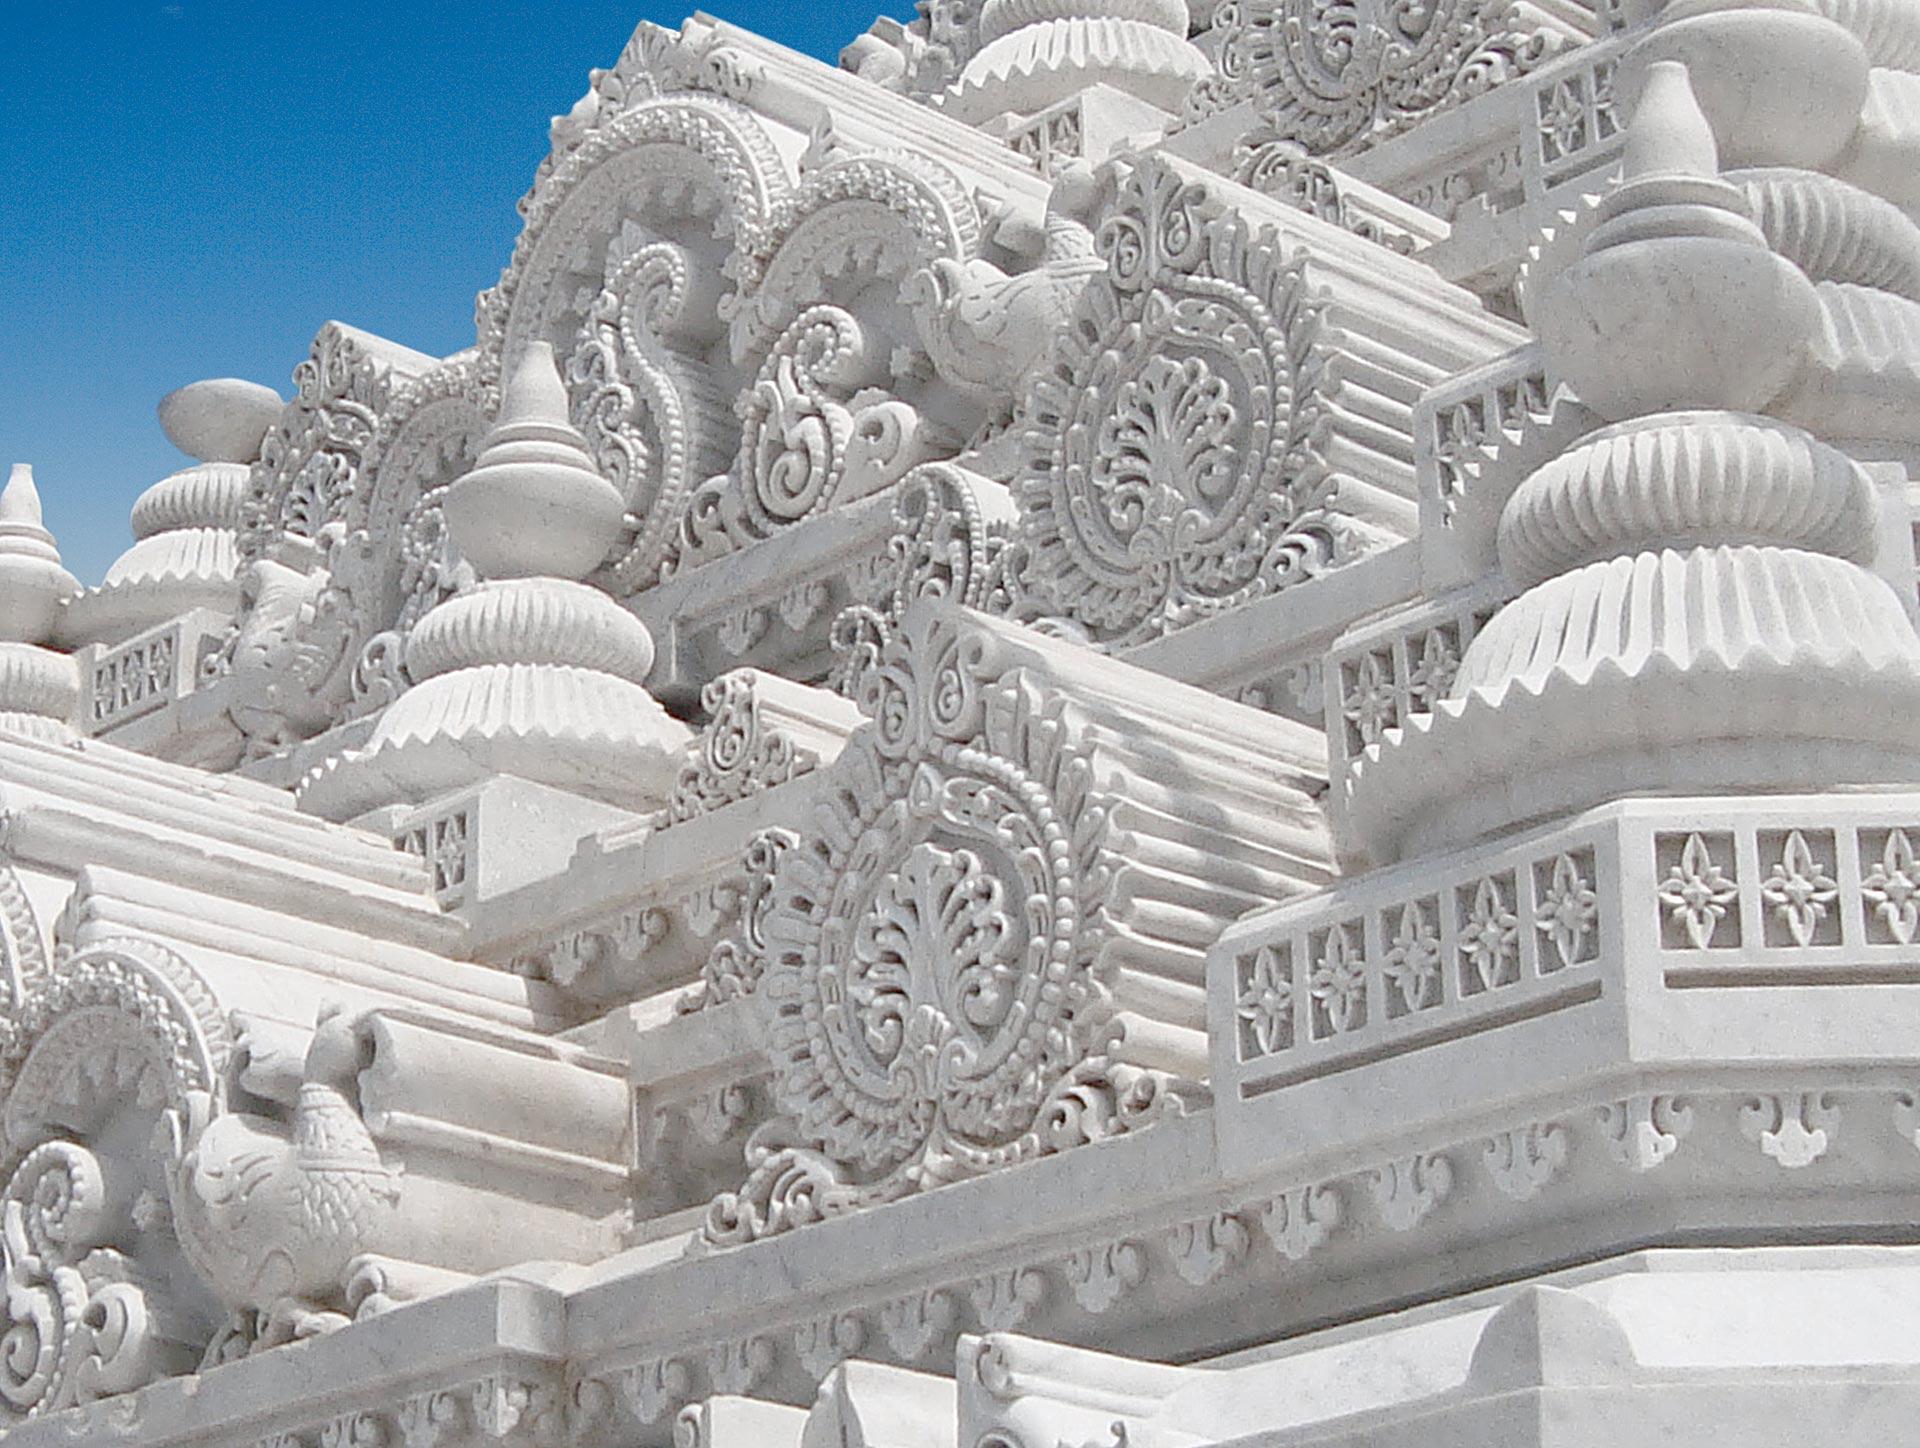 Temple_Prem_Mandir_India_02.jpg